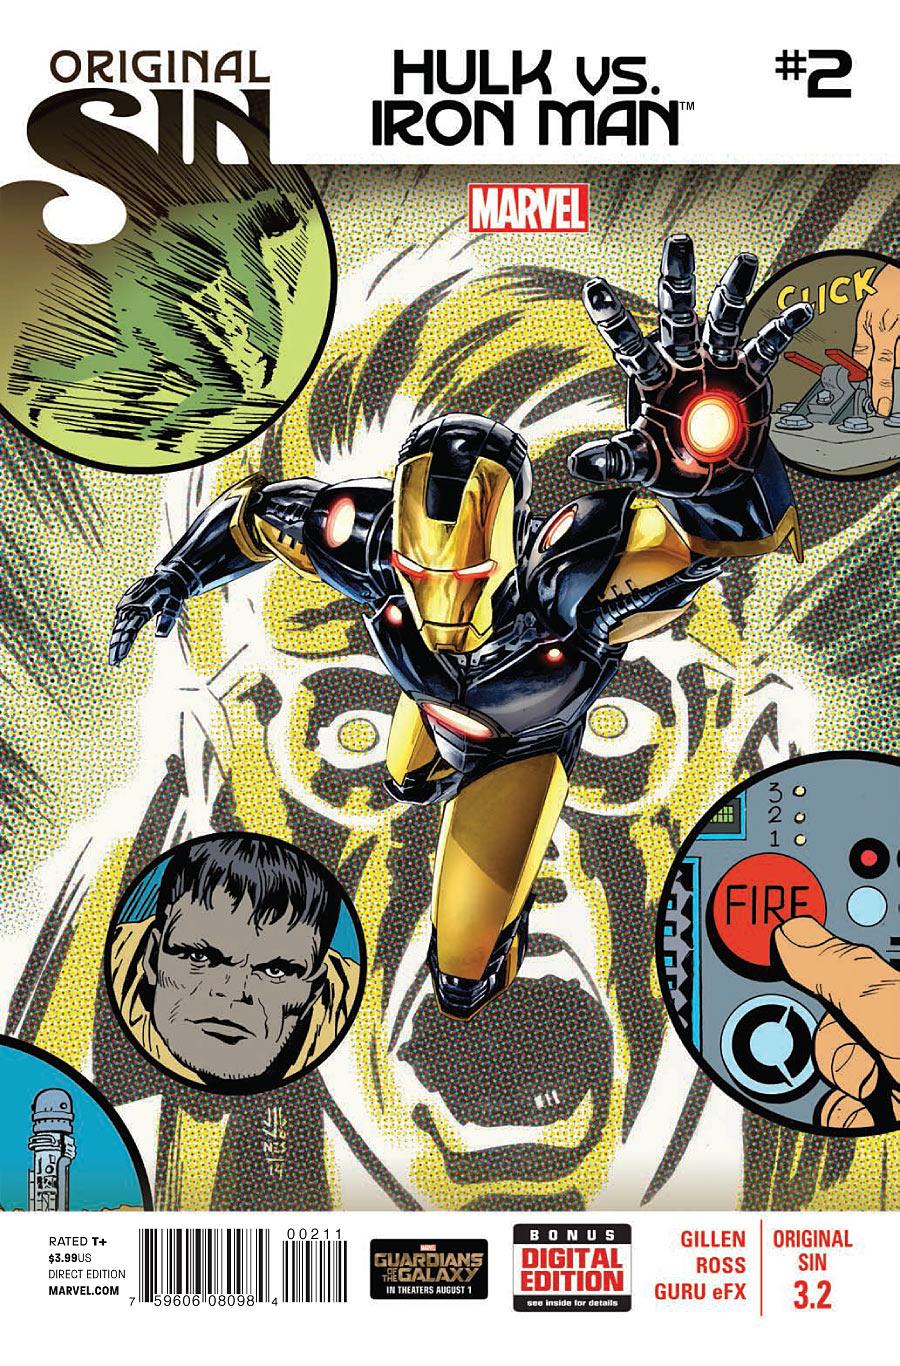 Original Sin 3.2 - Hulk Vs. Iron Man #2